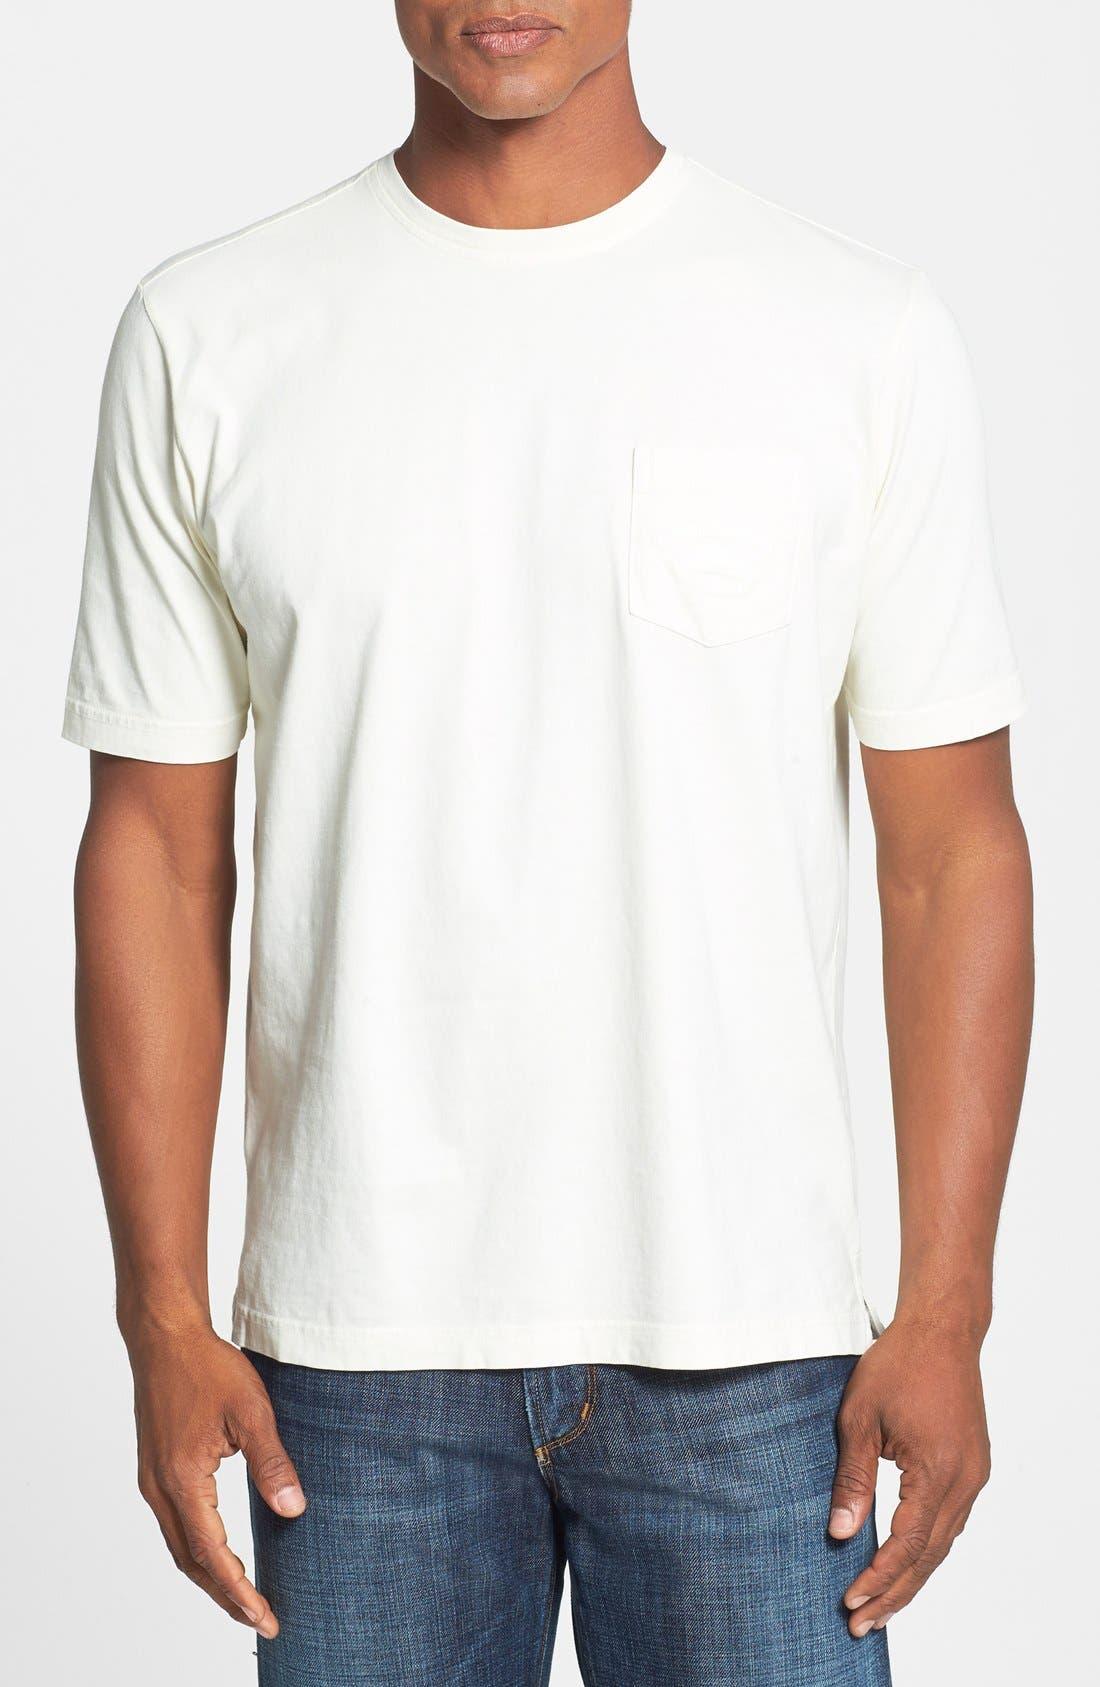 Main Image - Tommy Bahama Relax 'Bahama Tide' Island Modern Fit Short Sleeve T-Shirt